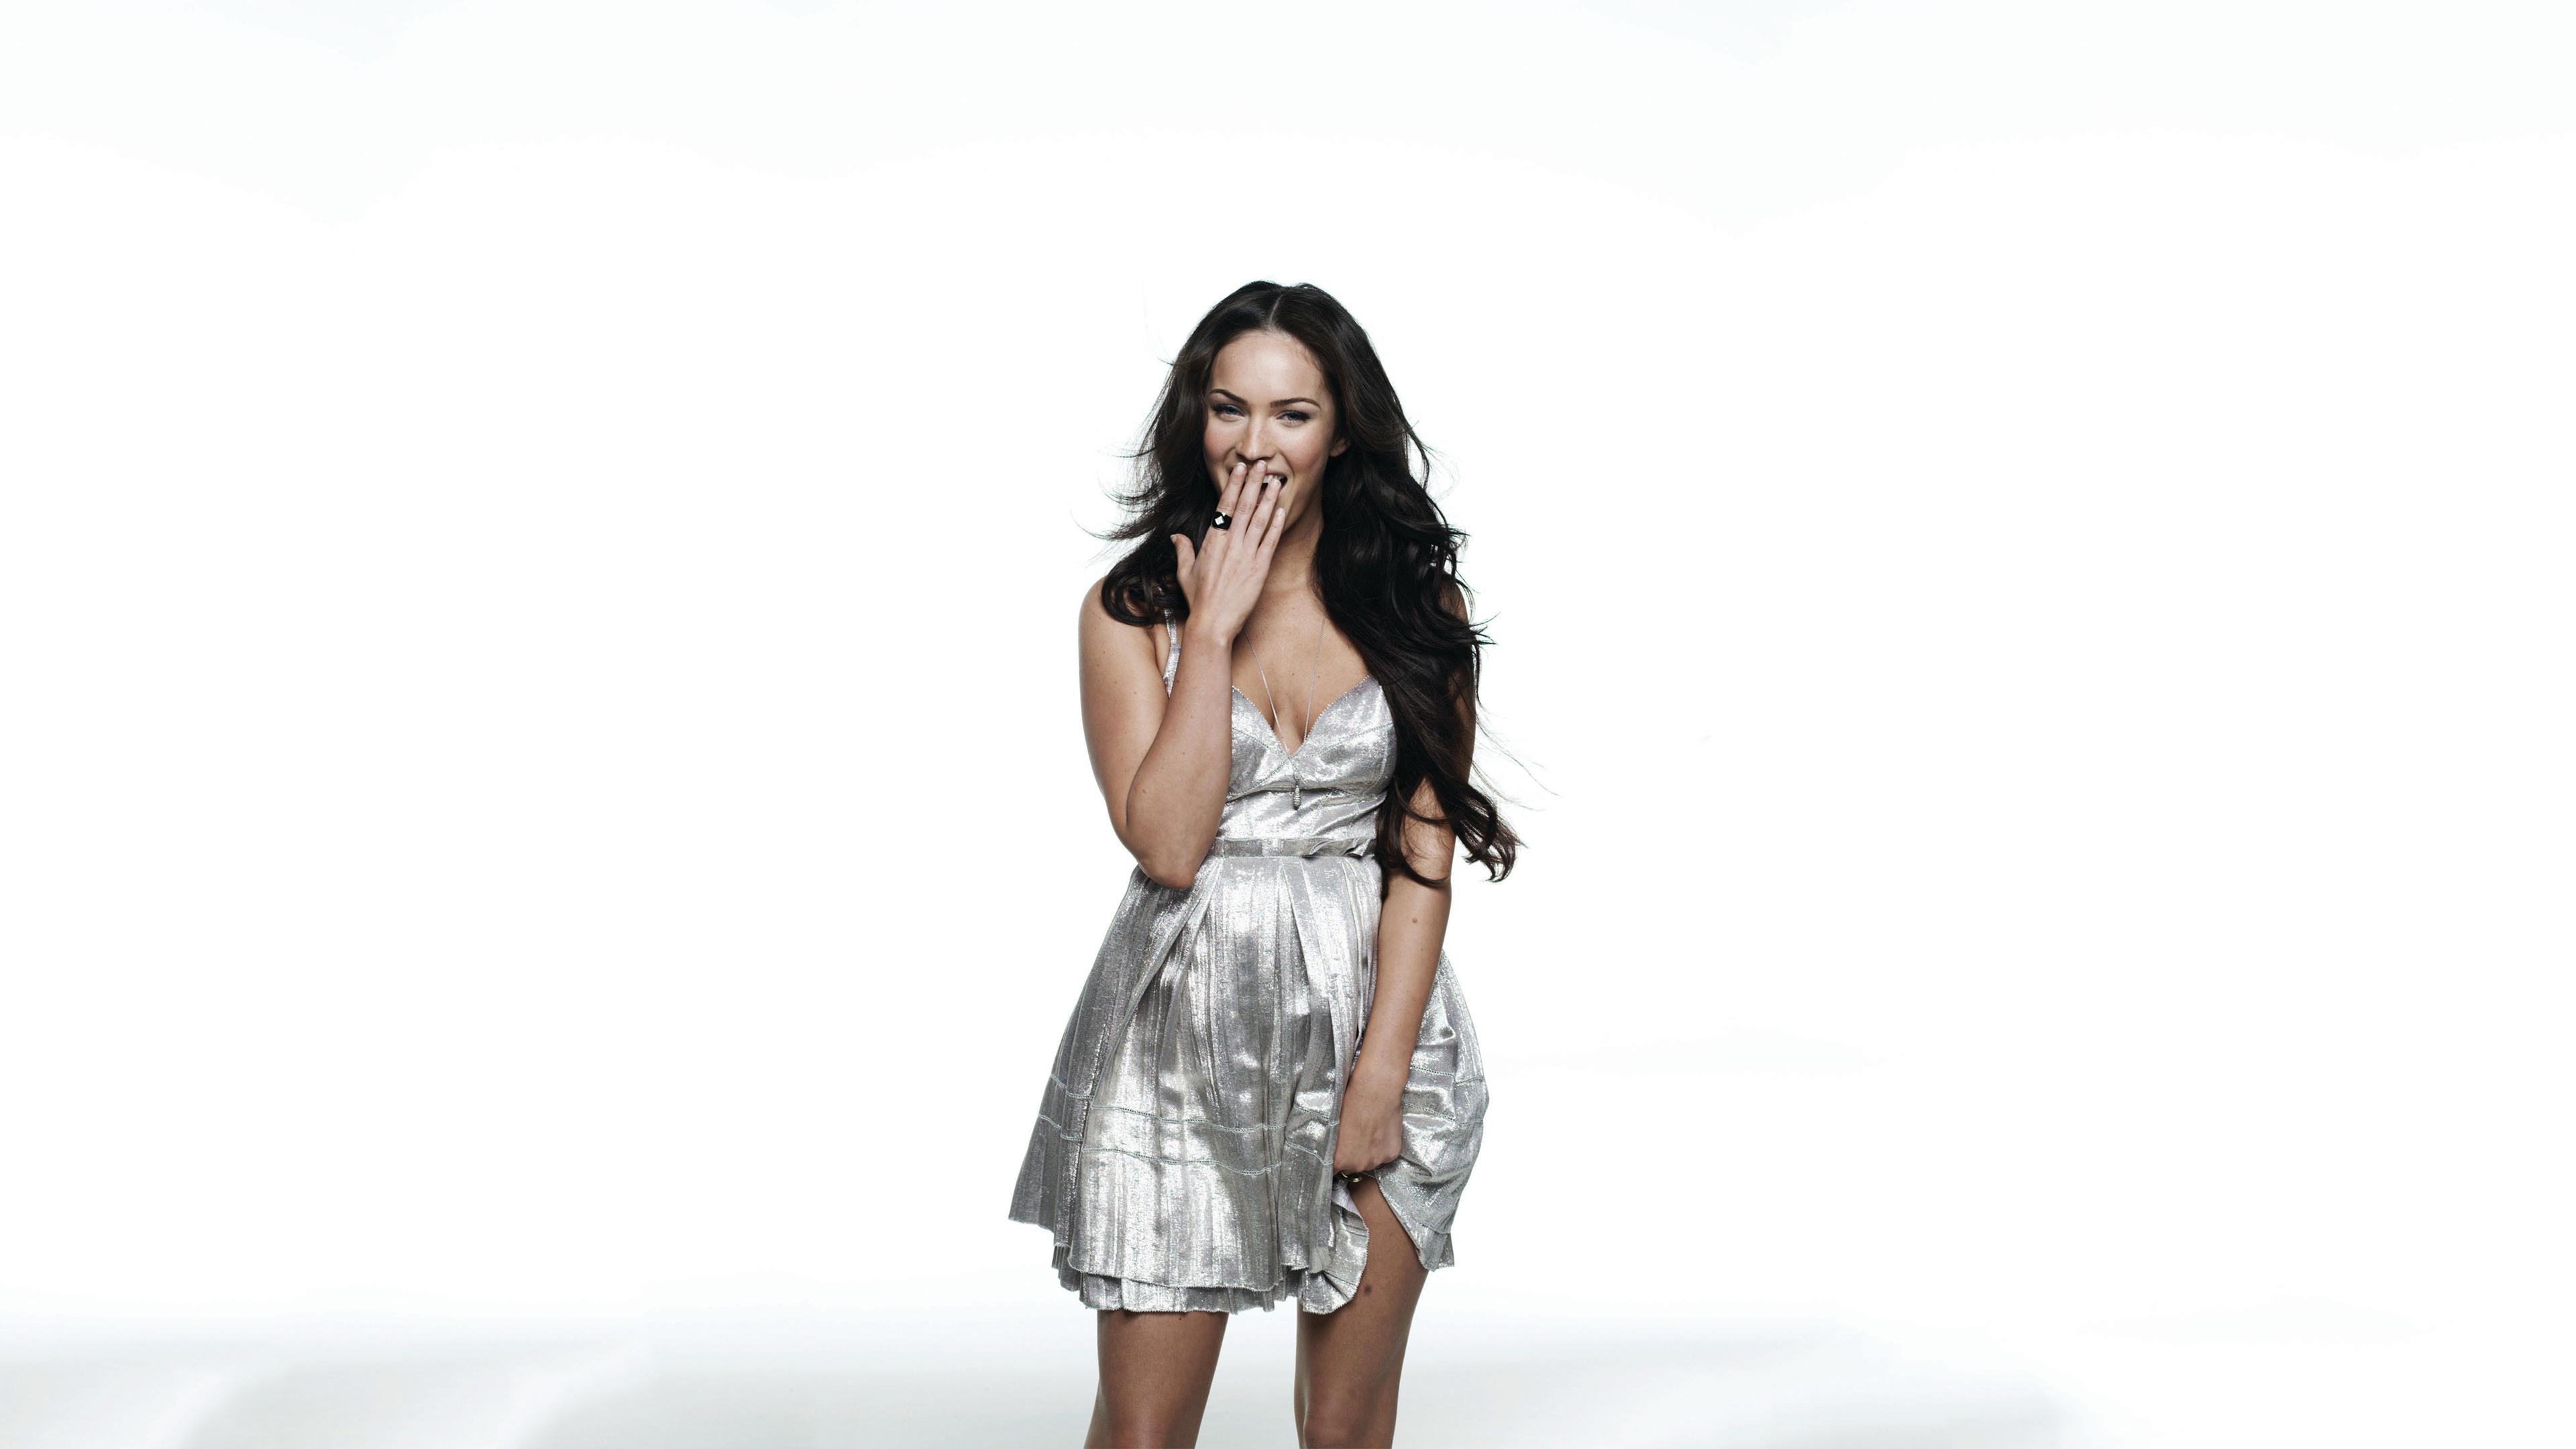 Megan Fox Wallpaper Hd Fantasy: Megan Fox Smiling 4k, HD Celebrities, 4k Wallpapers